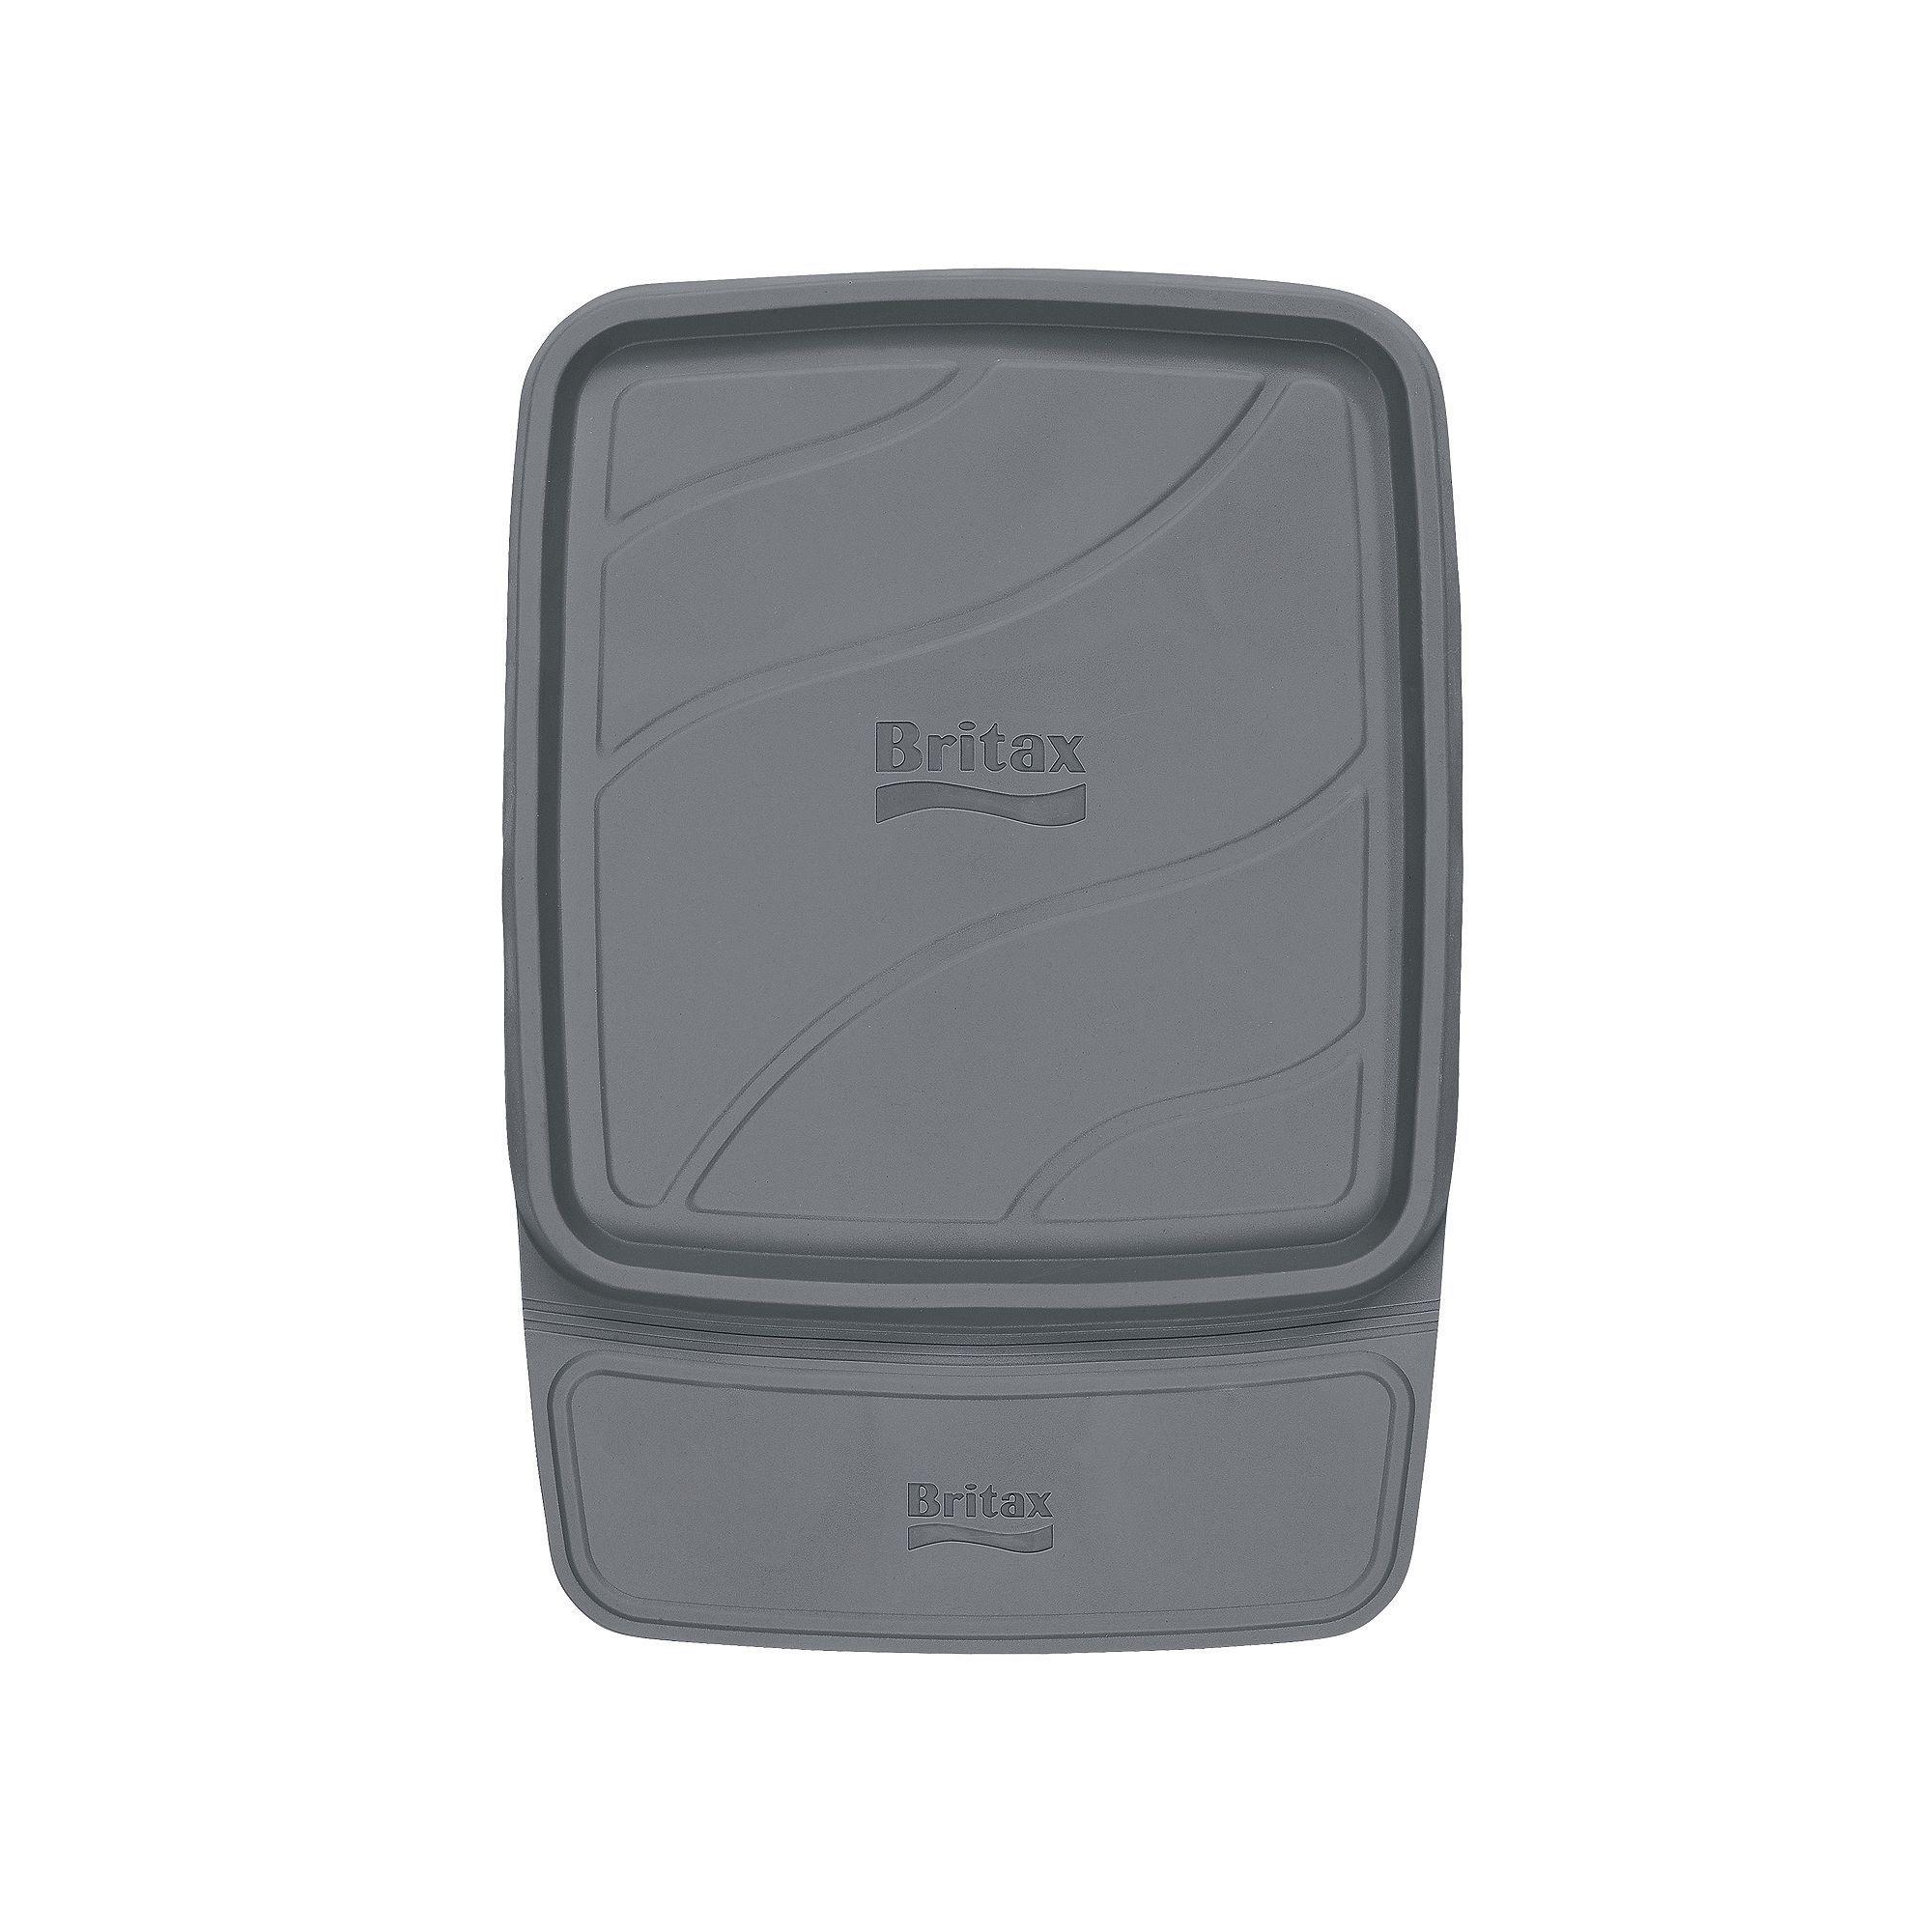 Britax Vehicle Seat Protector Seat protector, Car seat